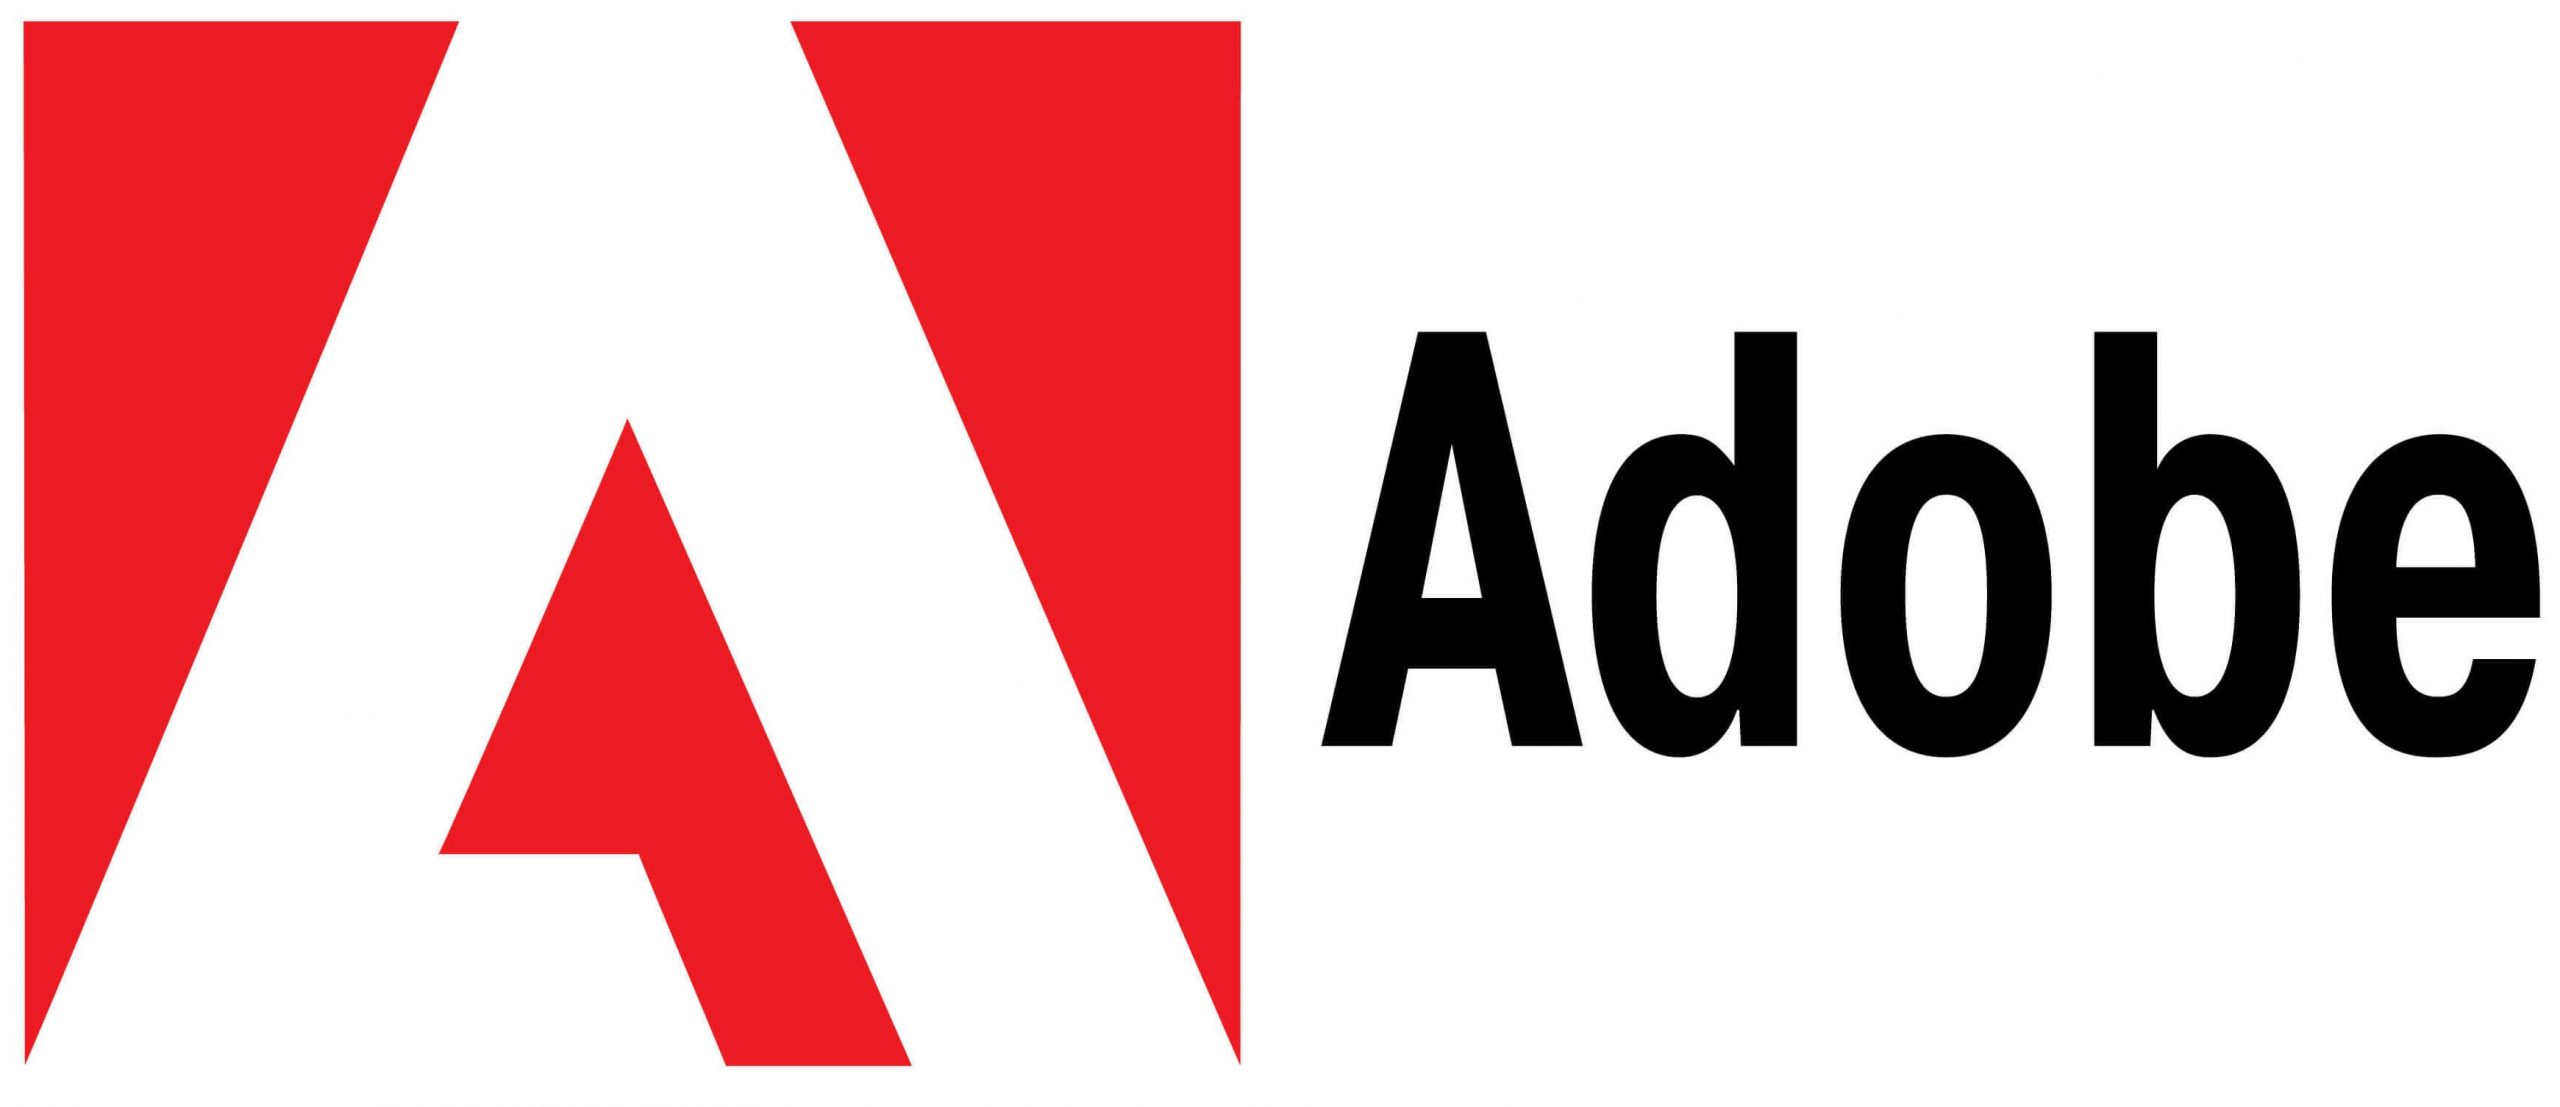 Adobe-logo-image